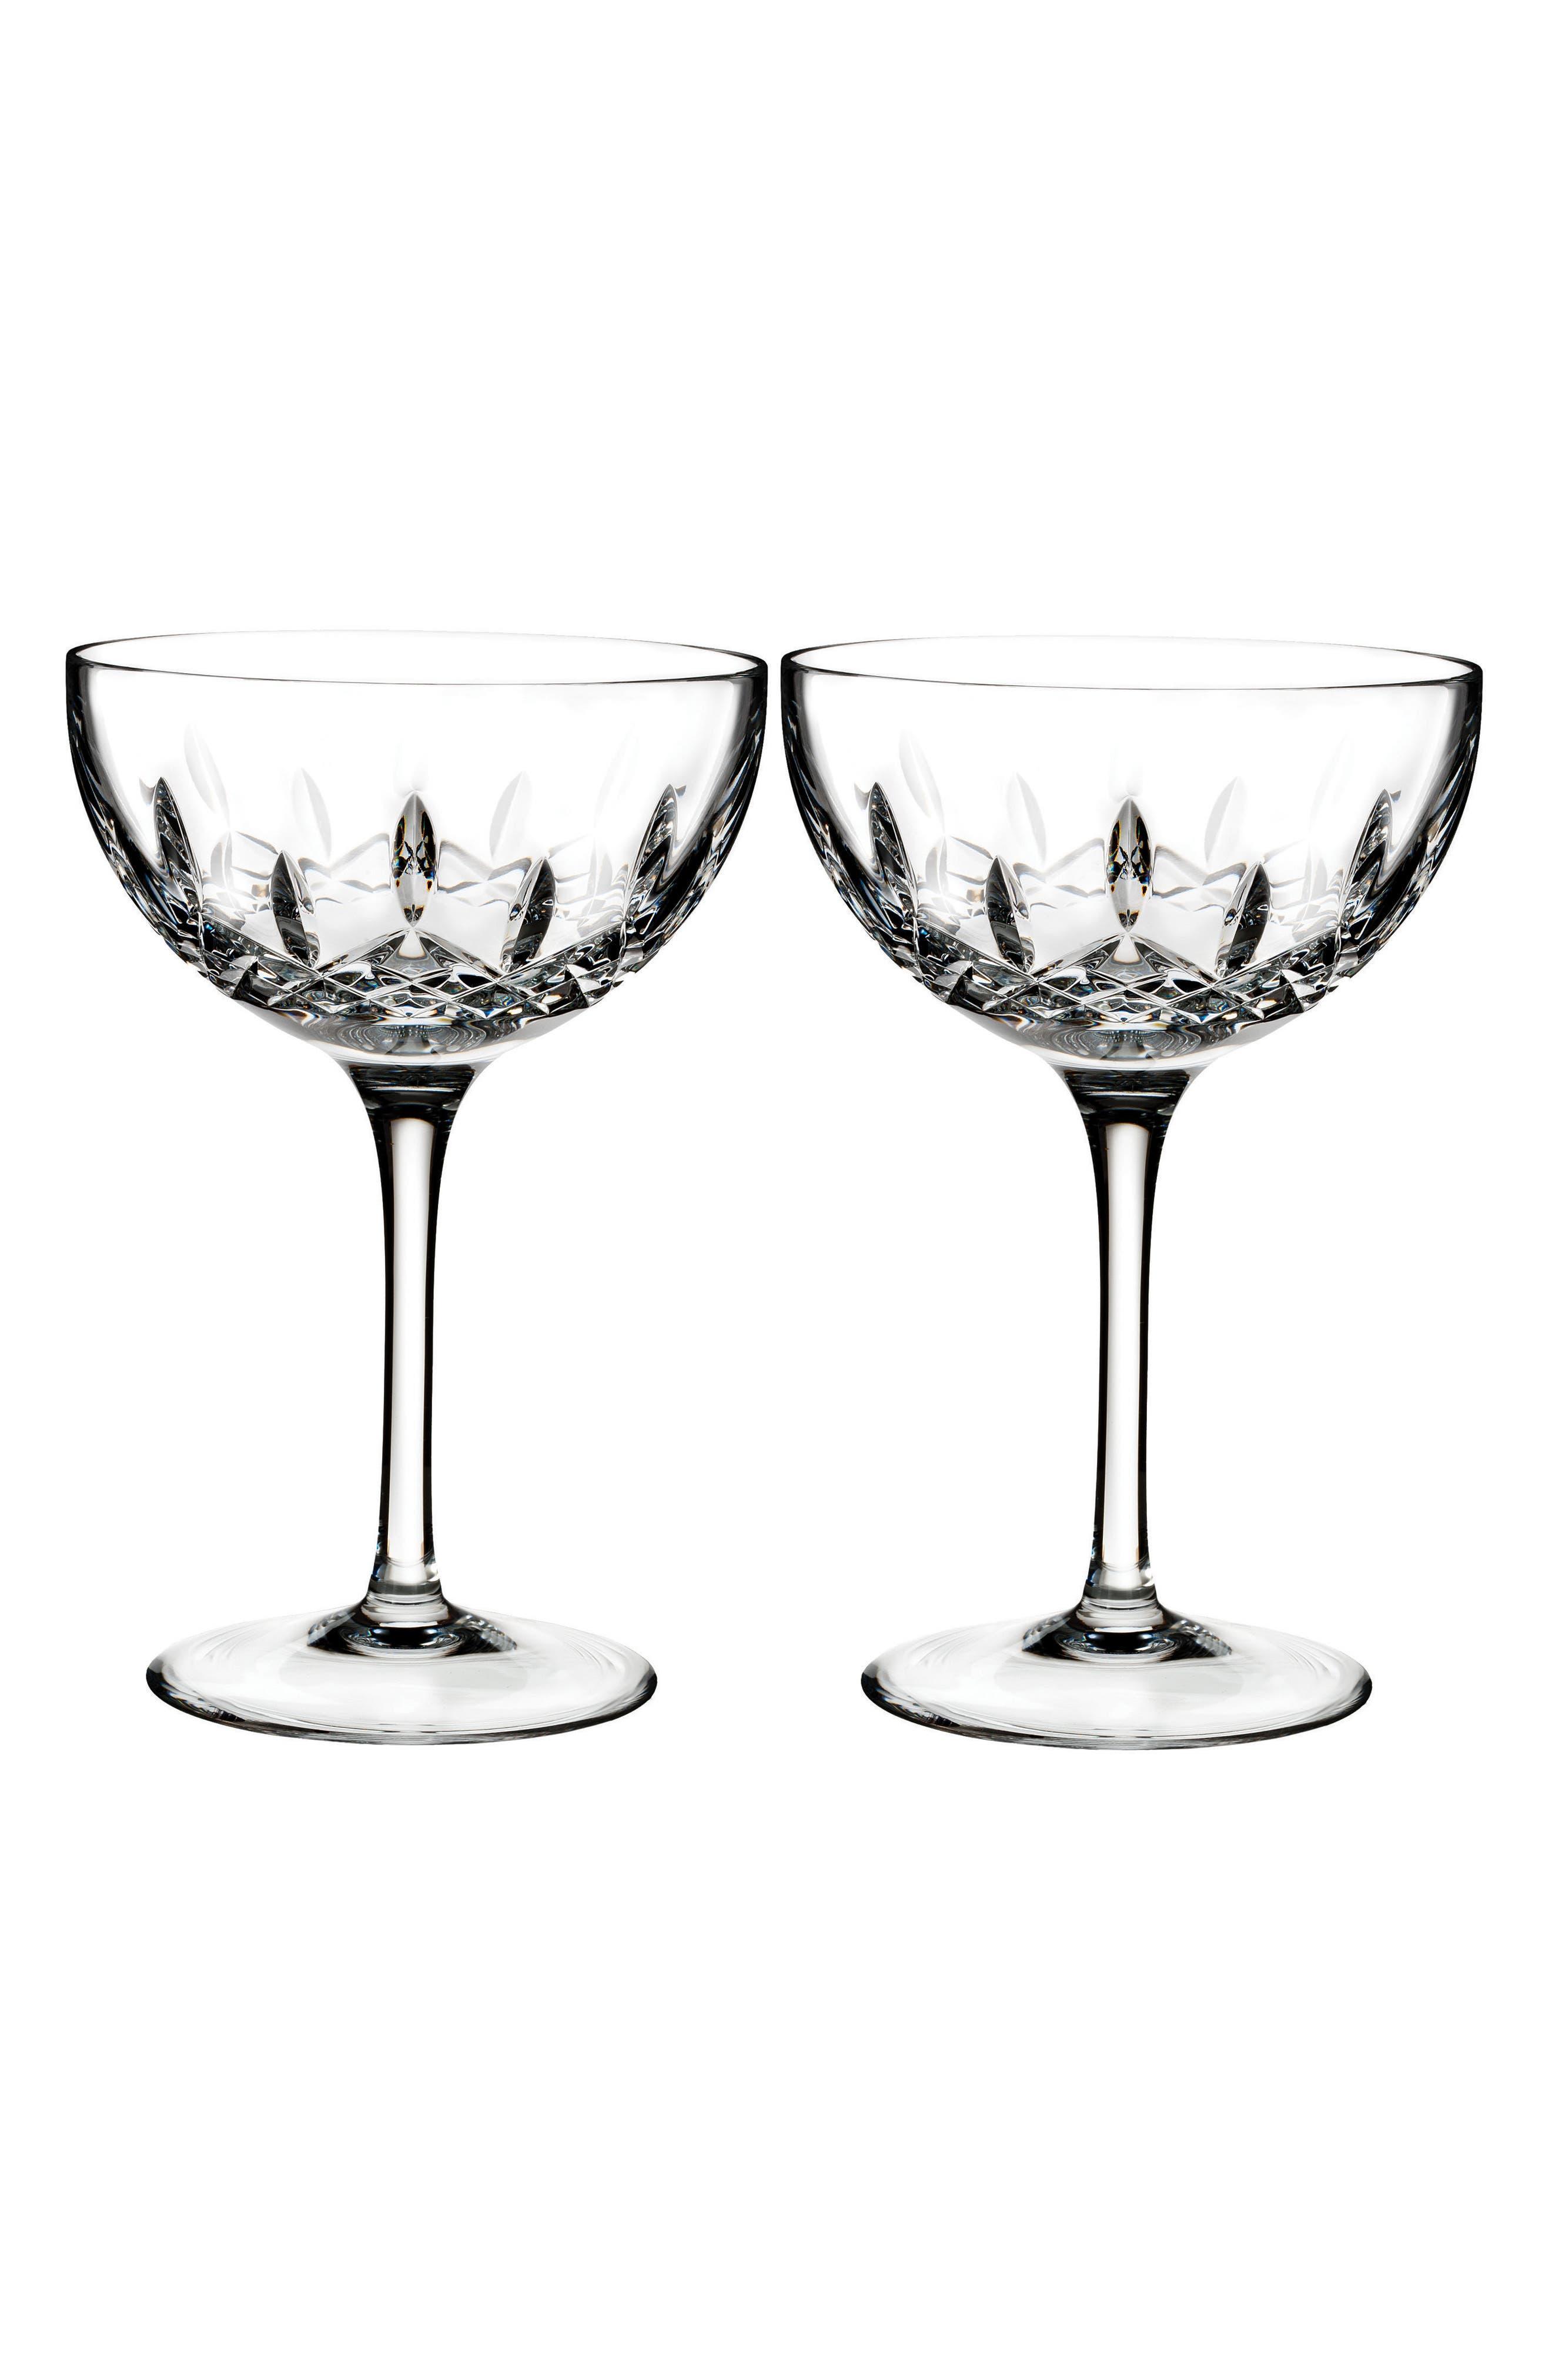 Lismore Pops Set of 2 Lead Crystal Cocktail Glasses,                             Main thumbnail 1, color,                             100